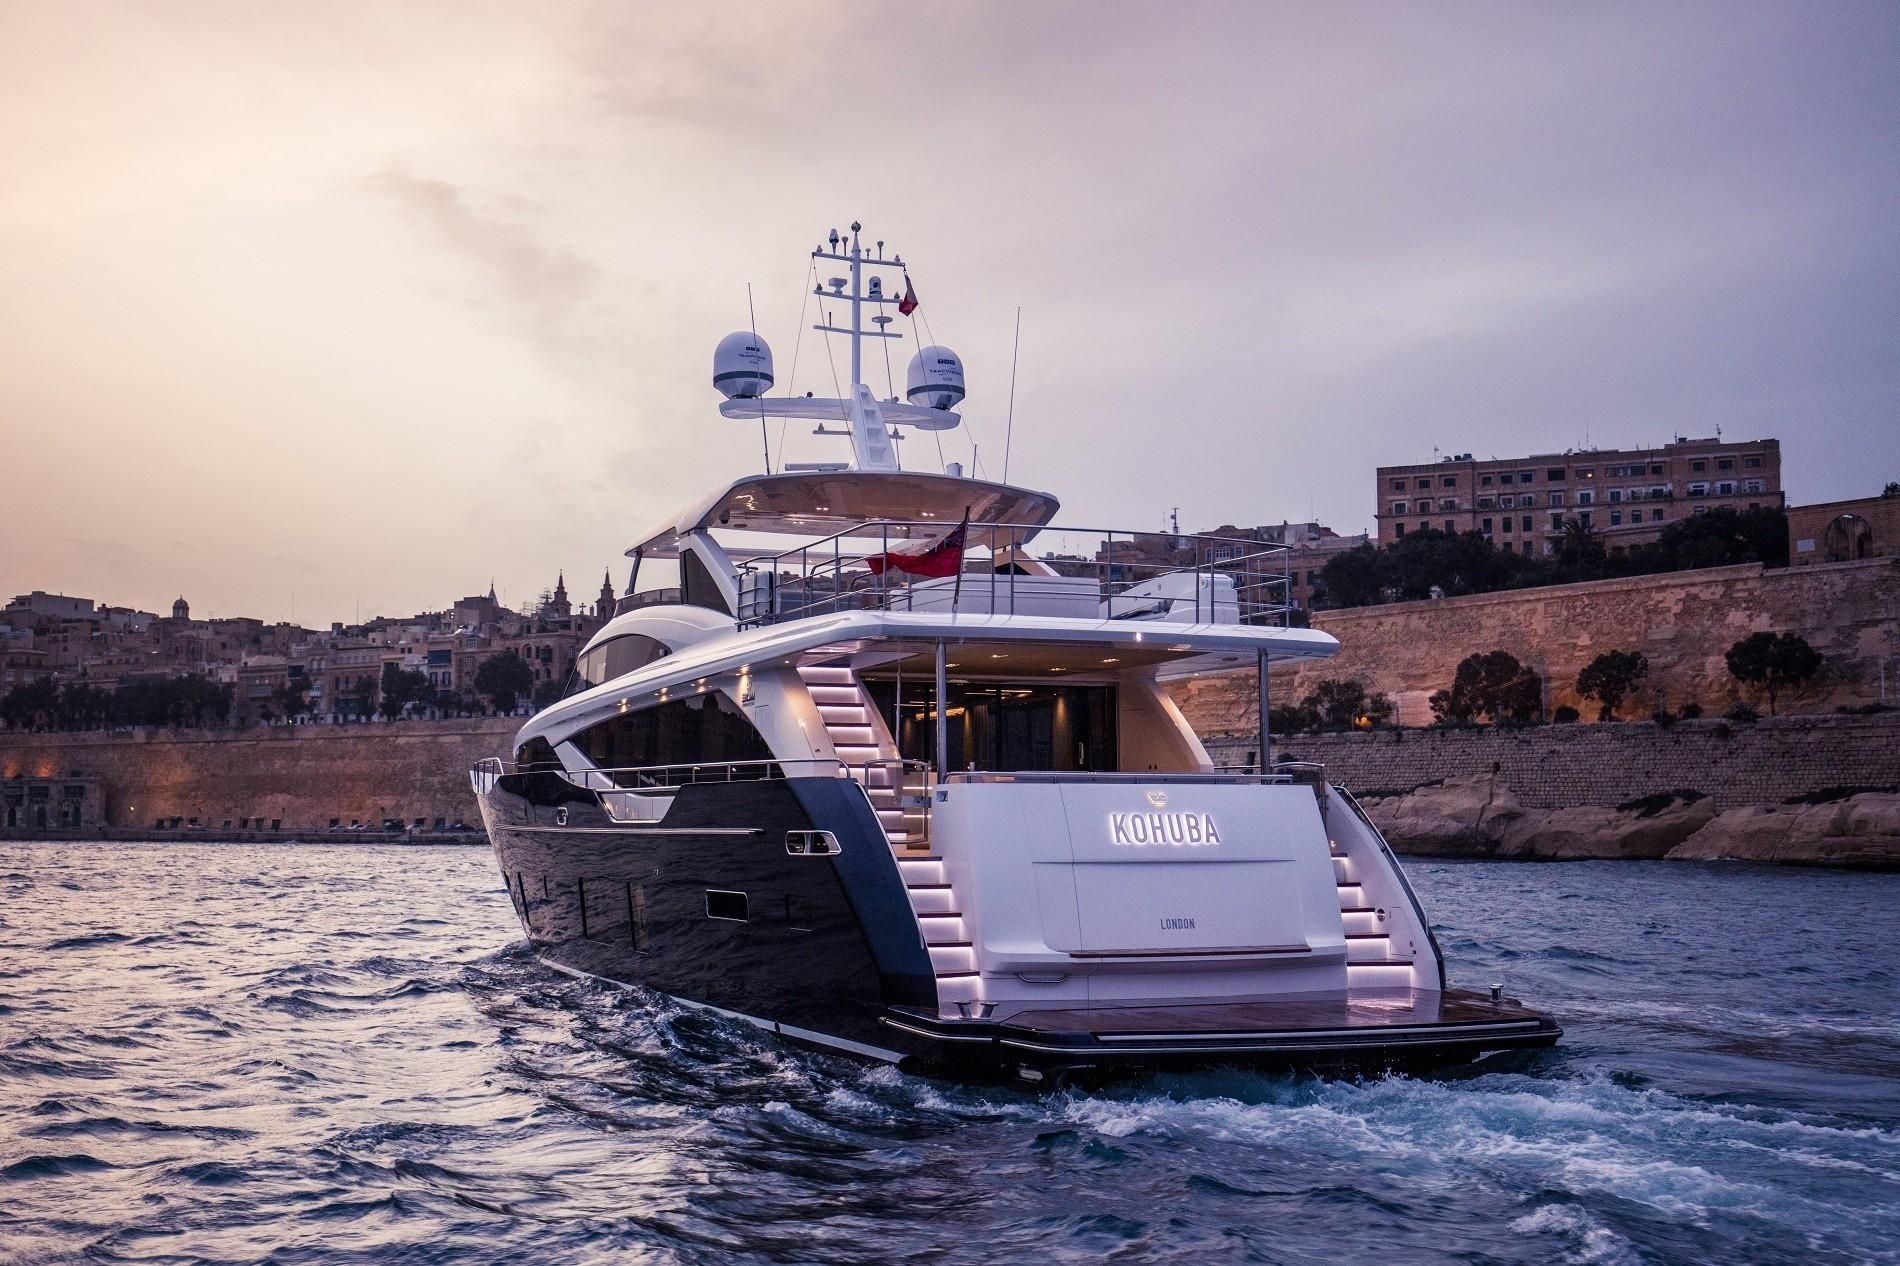 The 30m Yacht KOHUBA